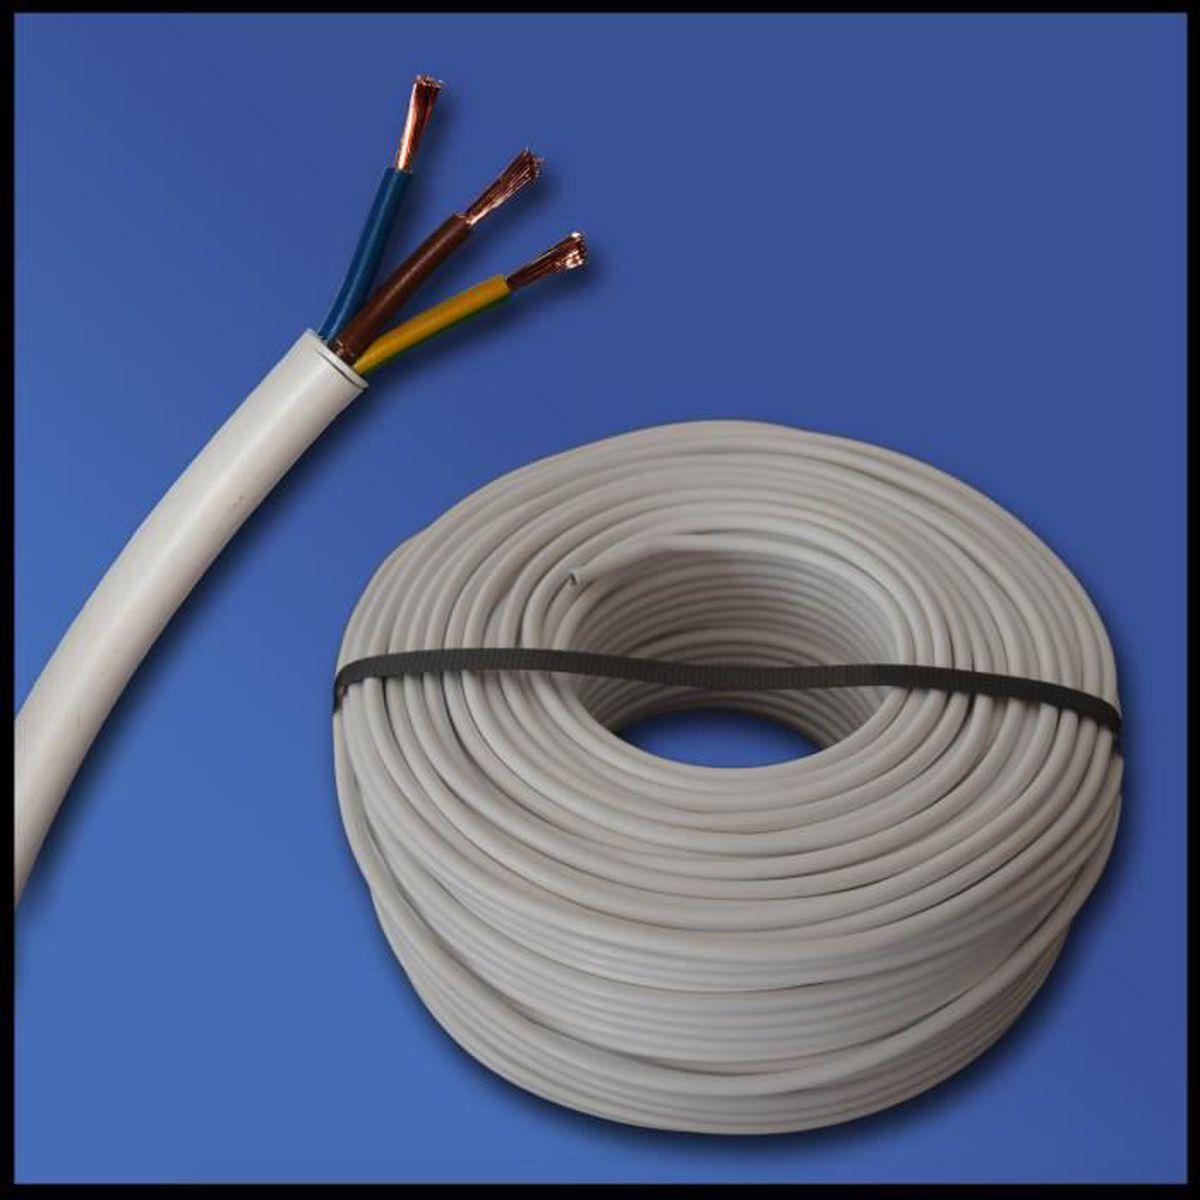 /25/m /Noir/ Tuyau flexible H03VV-F C/âble 3/G 0,75/mm/²/ /3/x 0,75/mm/²/